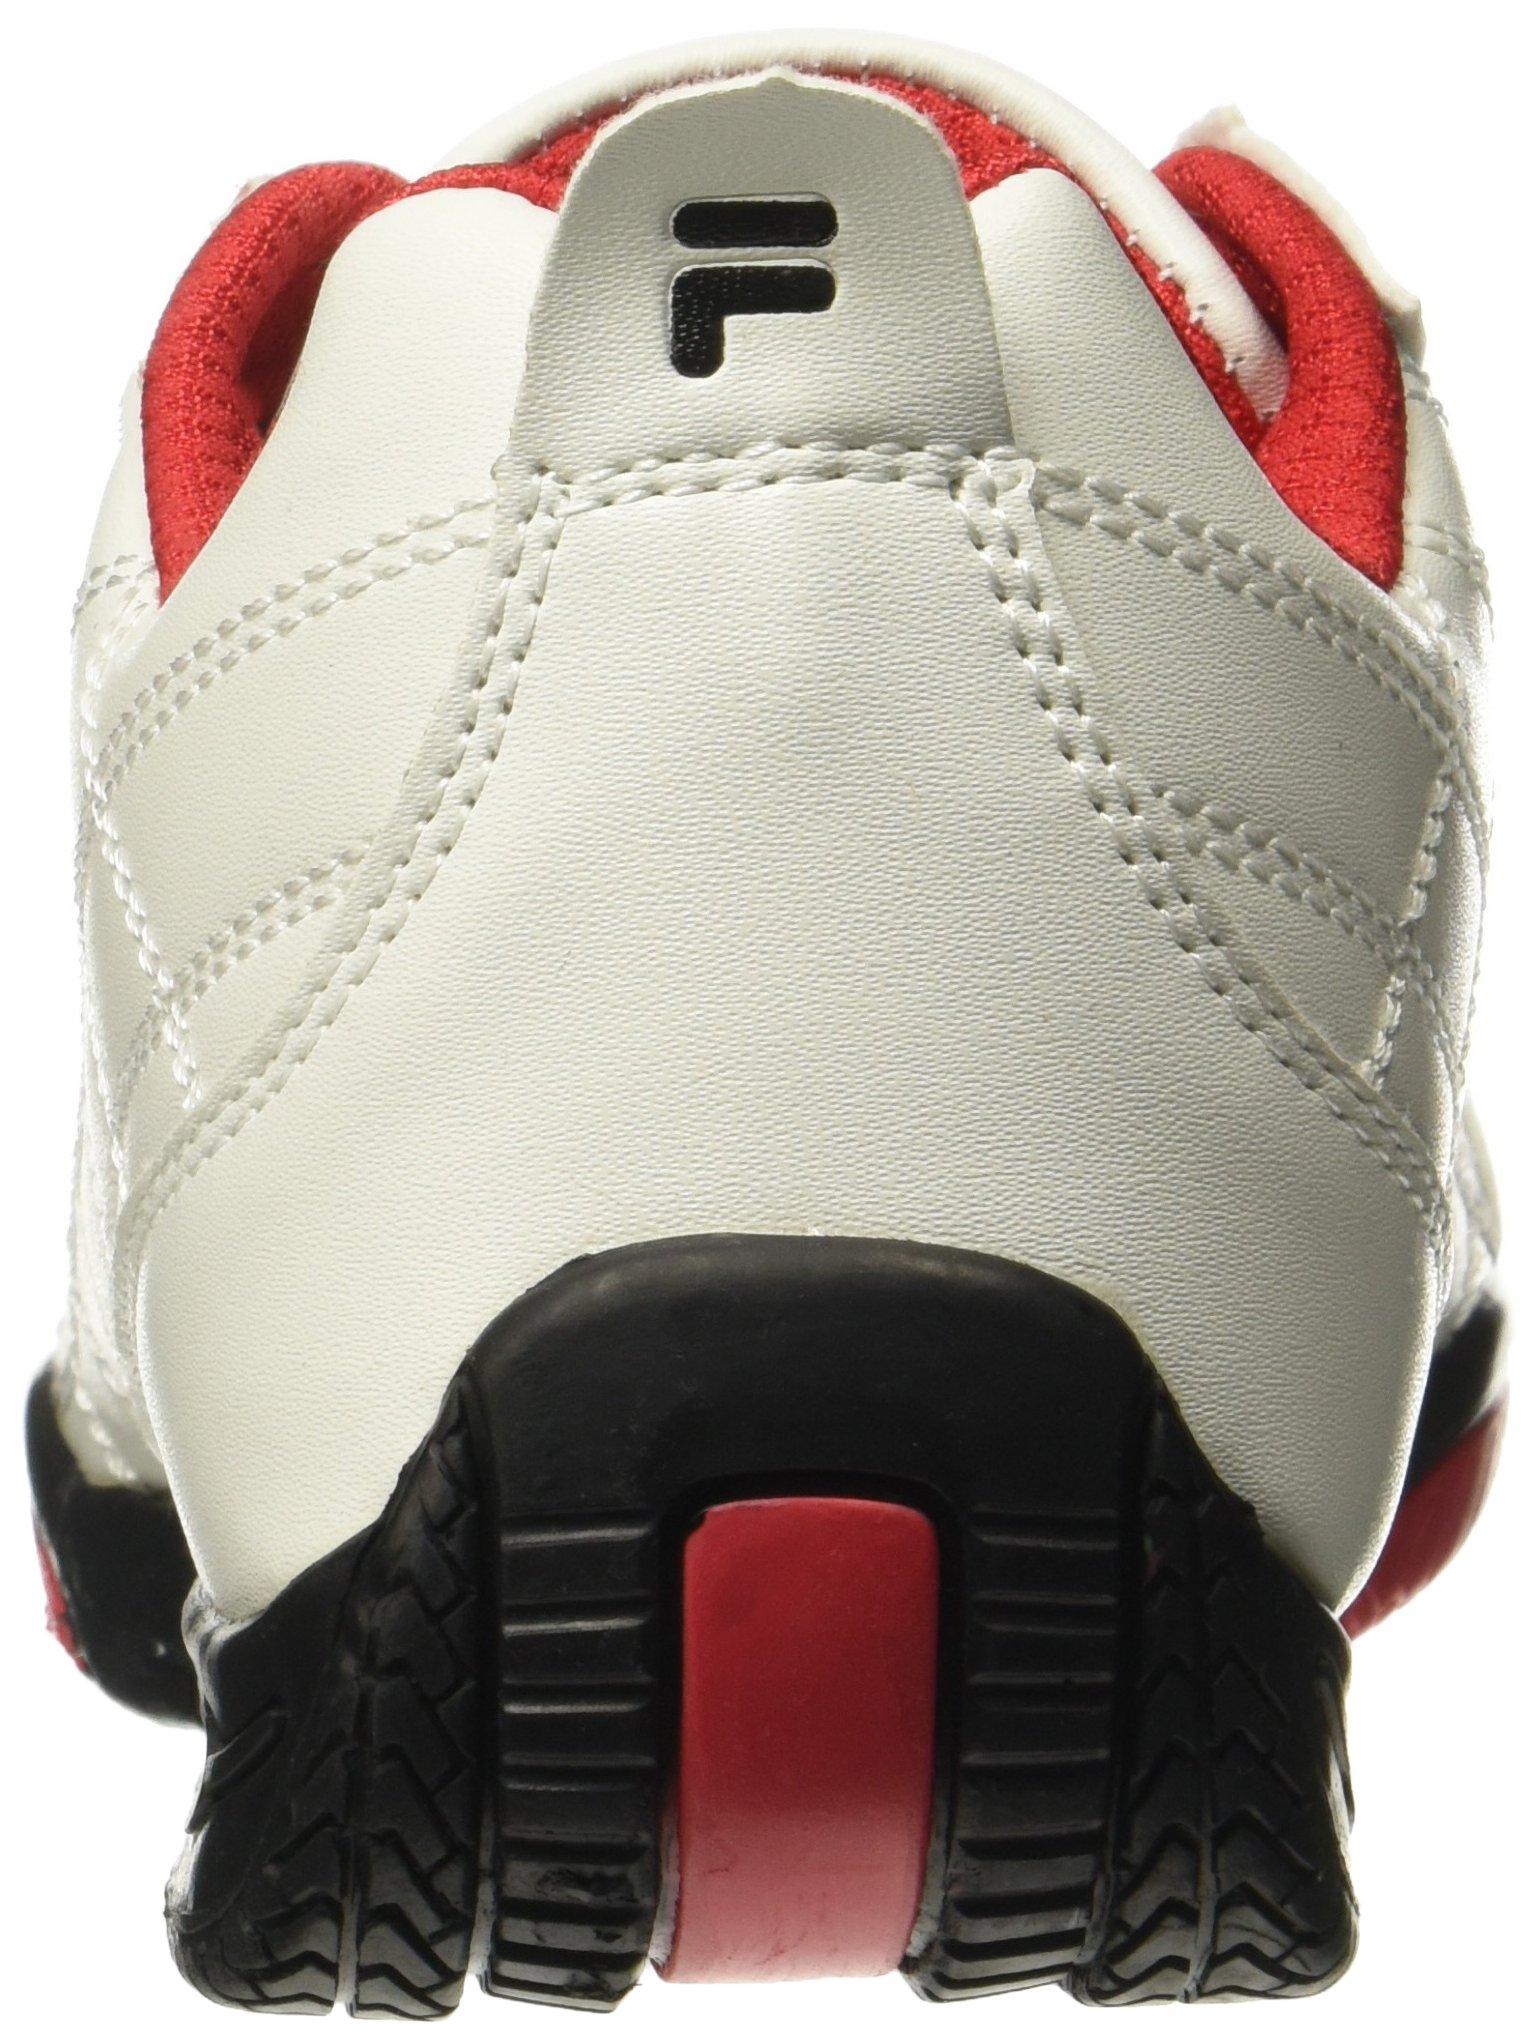 Fila Men's Erupt Mid Basketball Shoes